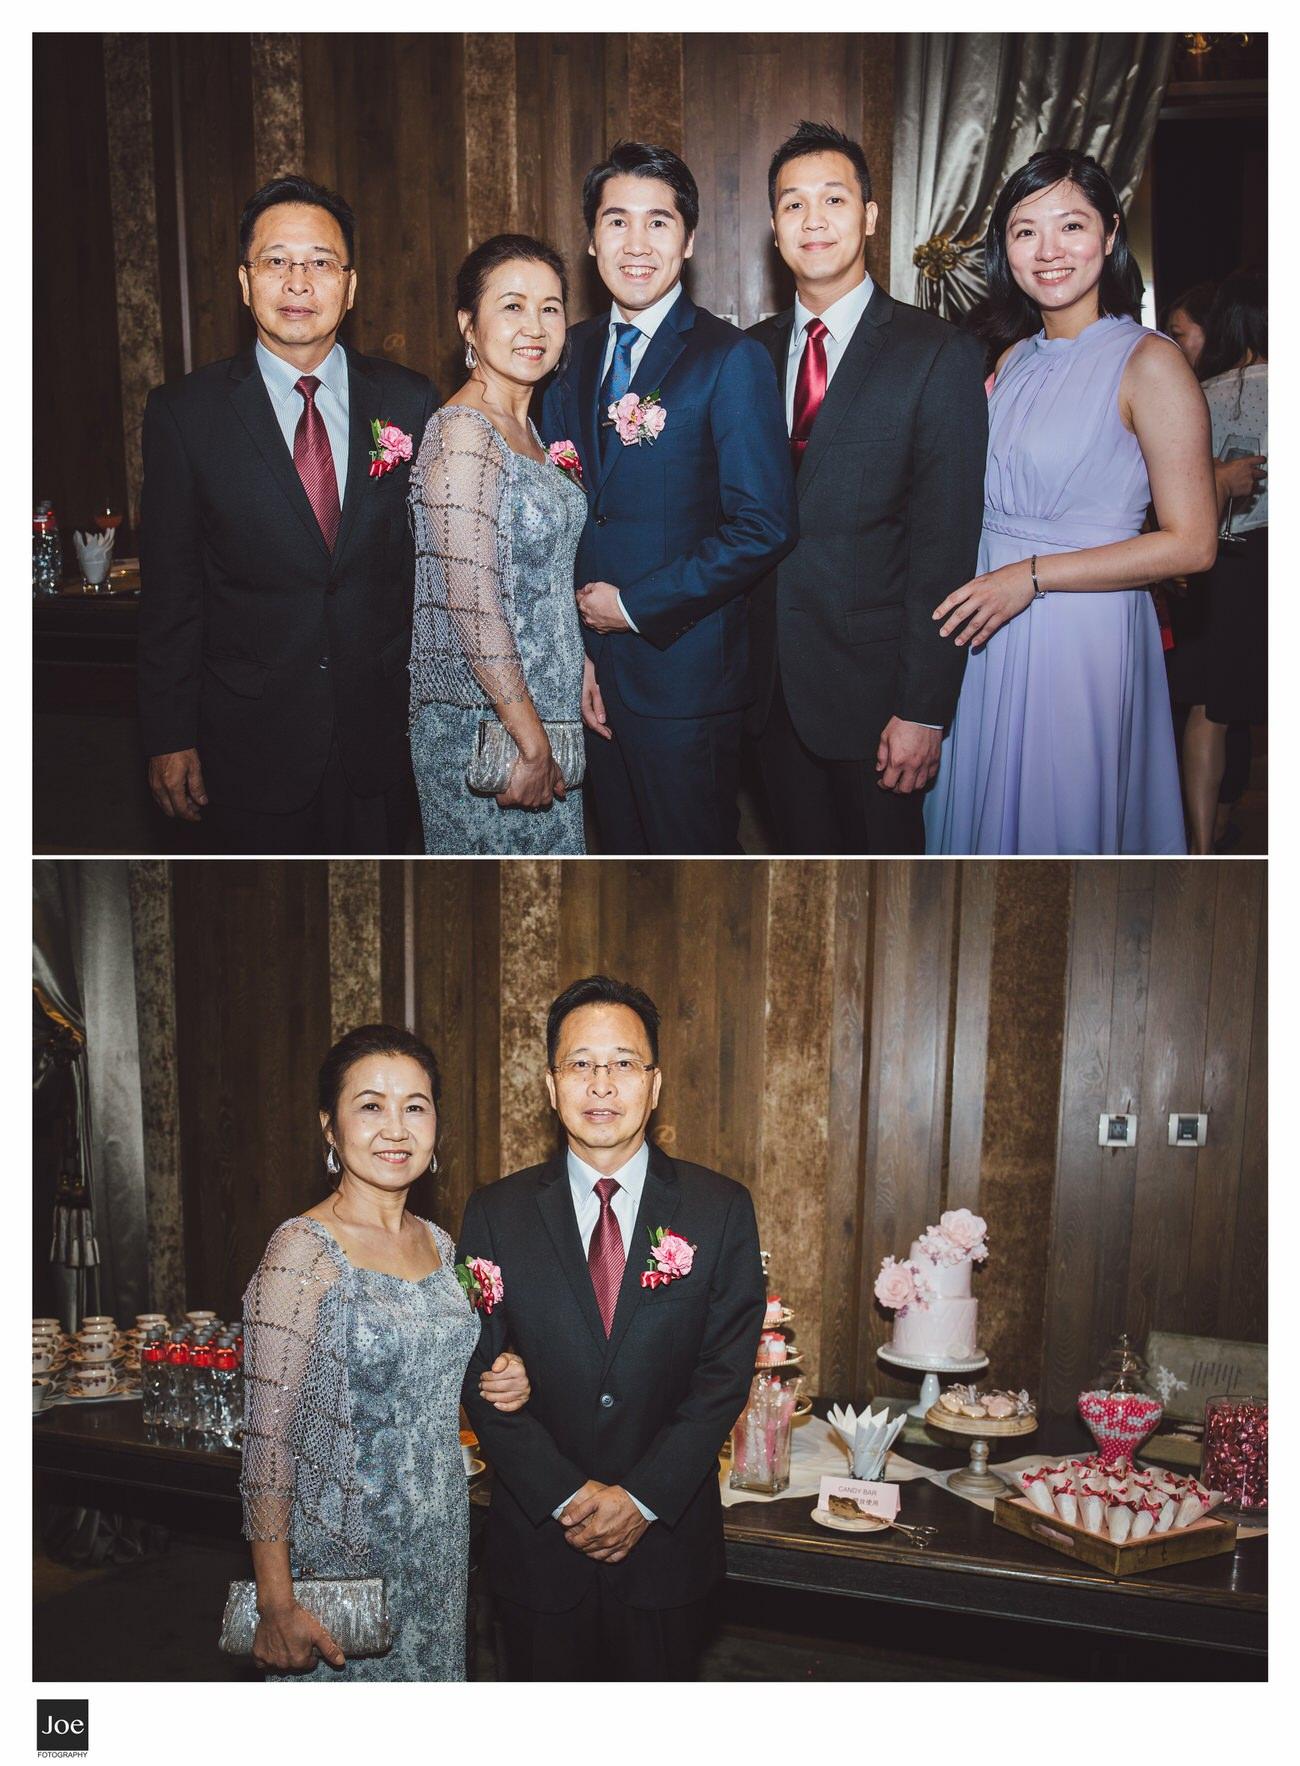 joe-fotography-wedding-photo-palais-de-chine-hotel-016.jpg